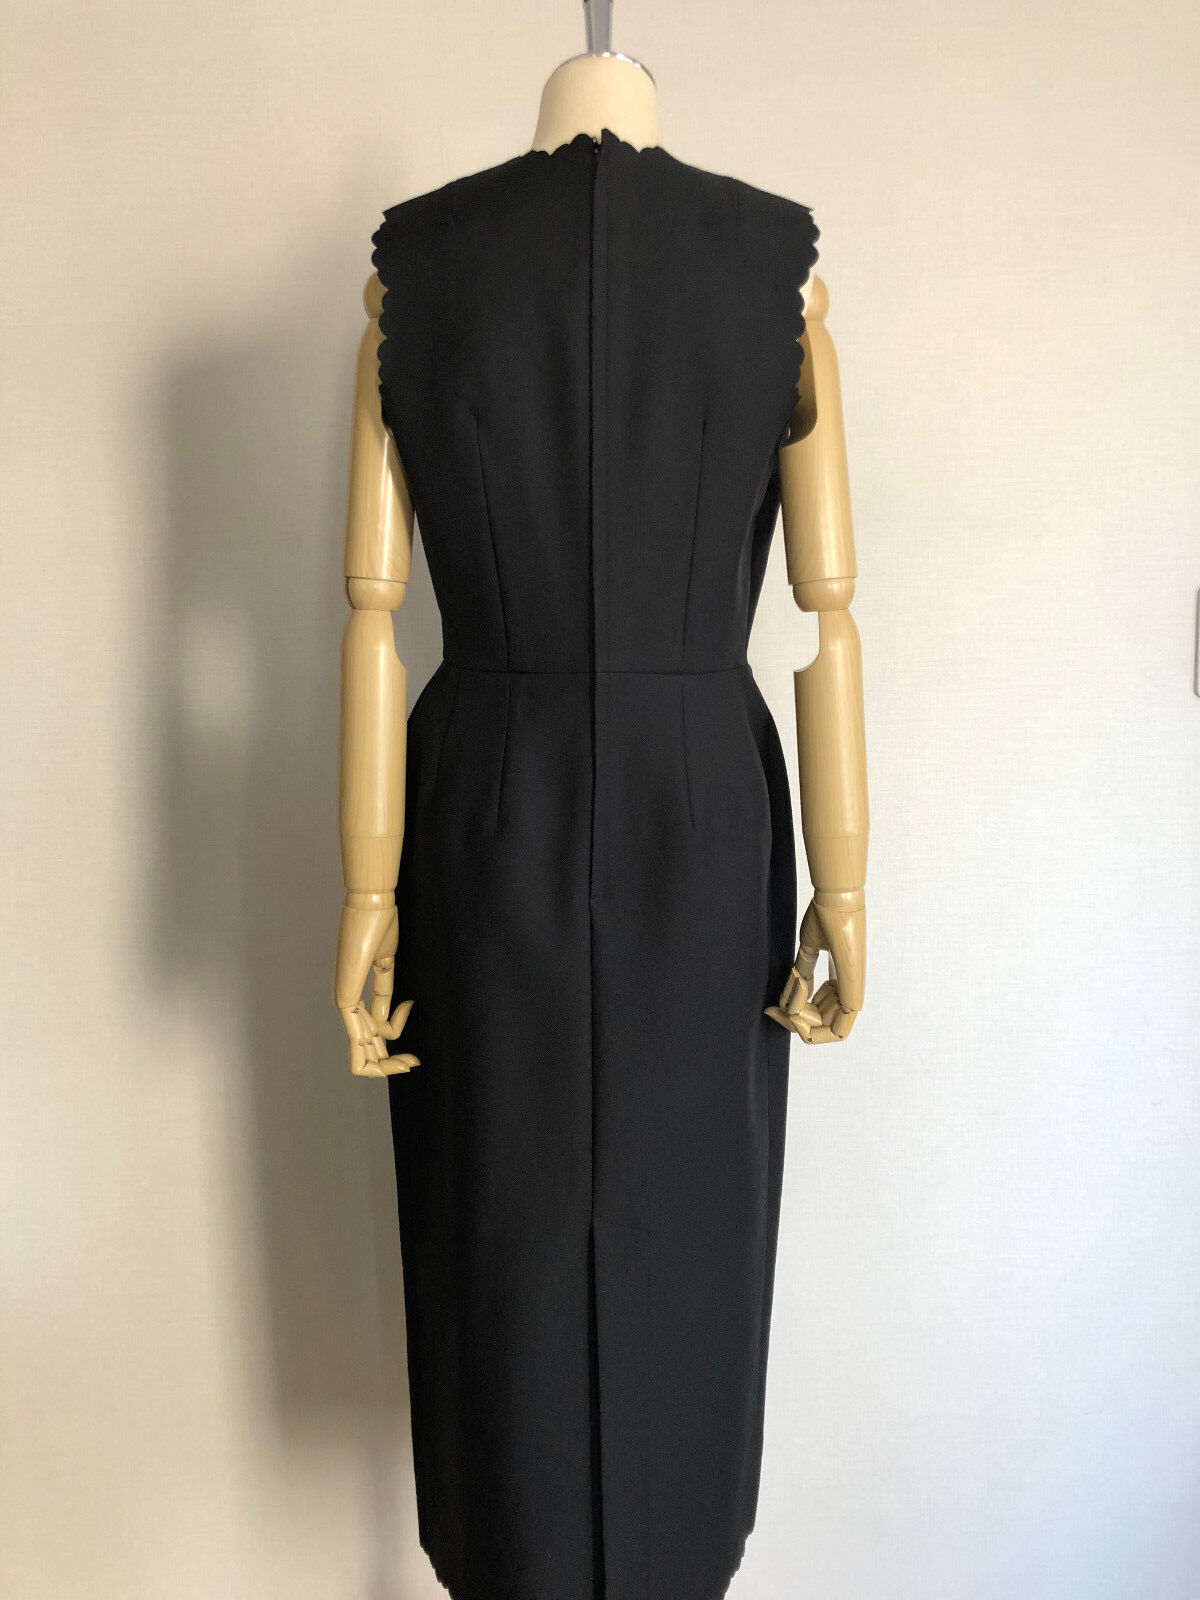 AD1998 Vintage Comme Des Garcons dress - image 7